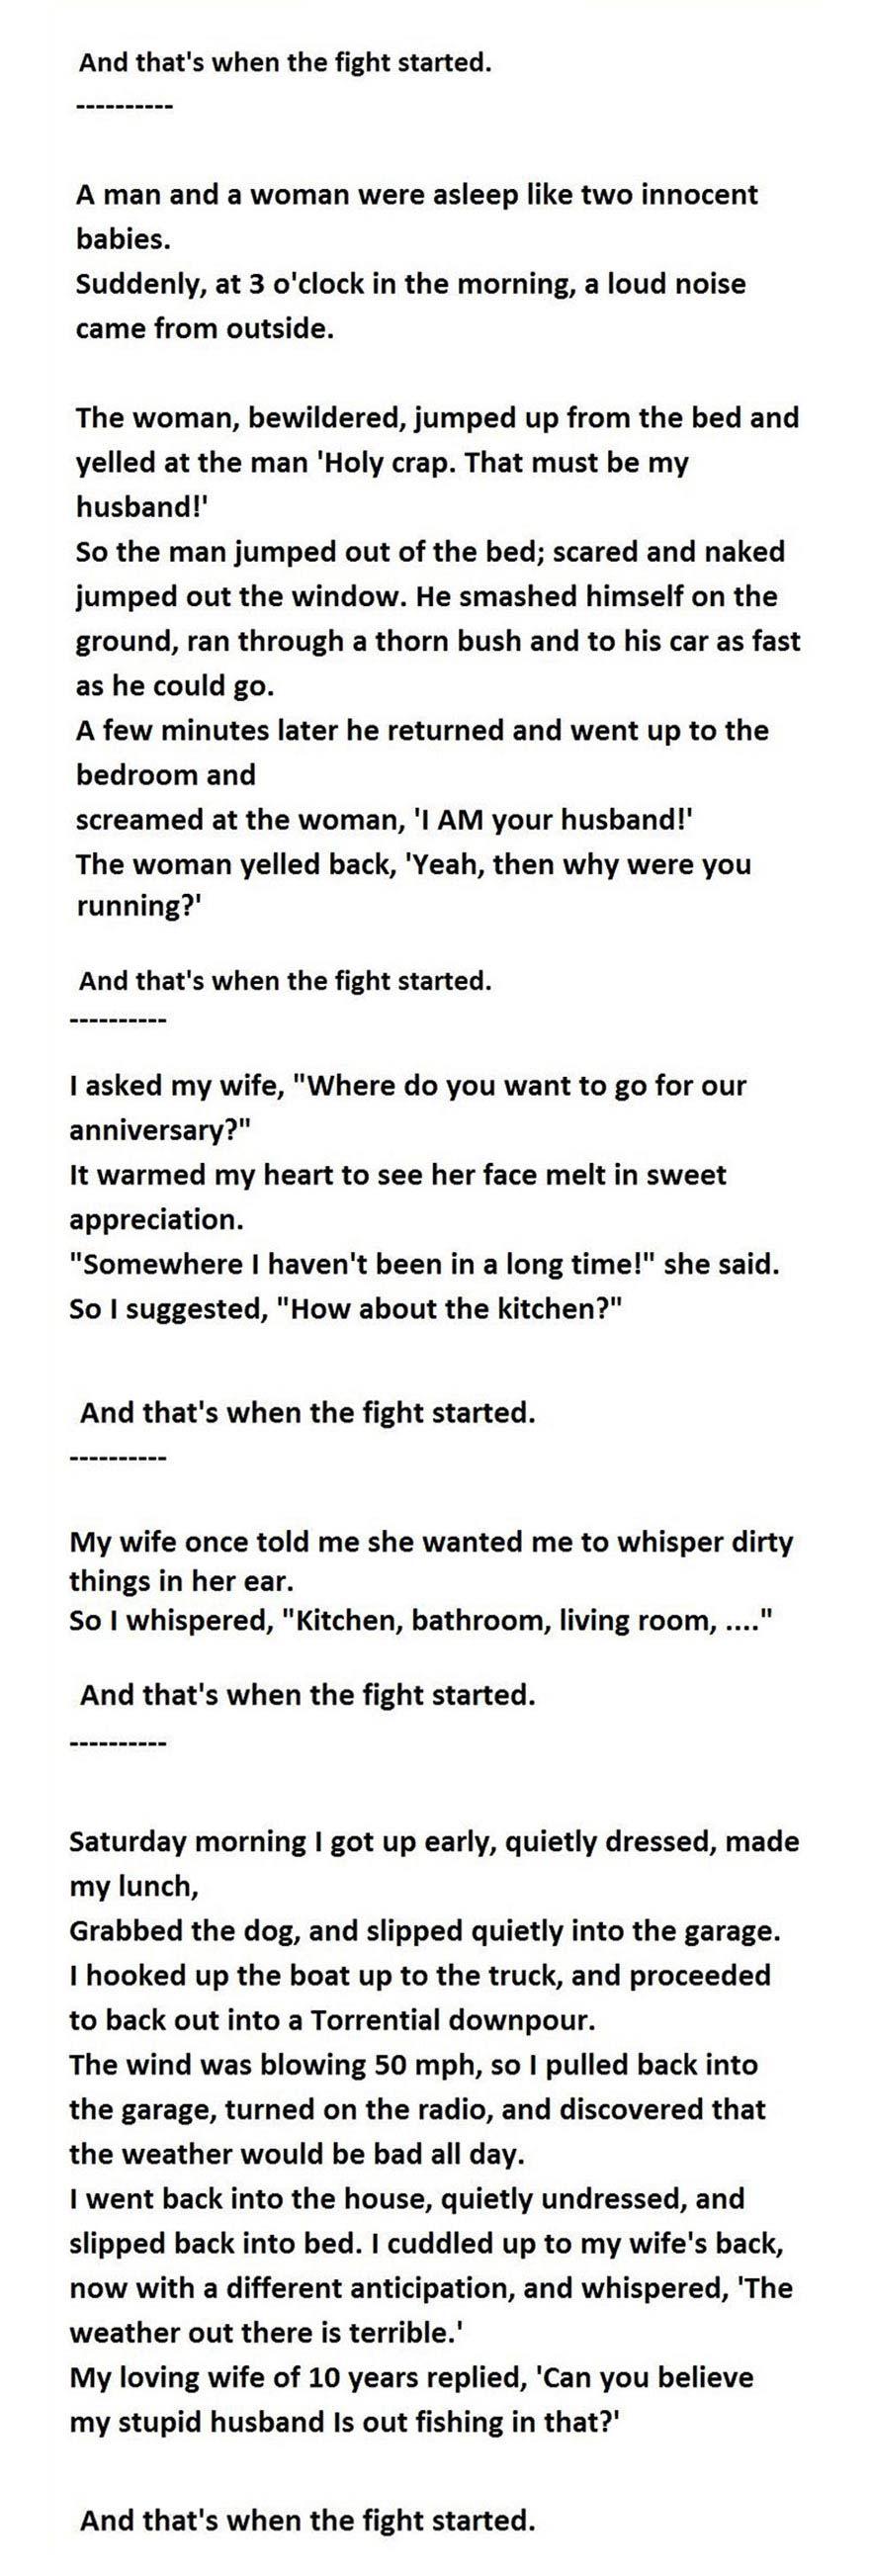 funny-ending-relationships-dress-wife